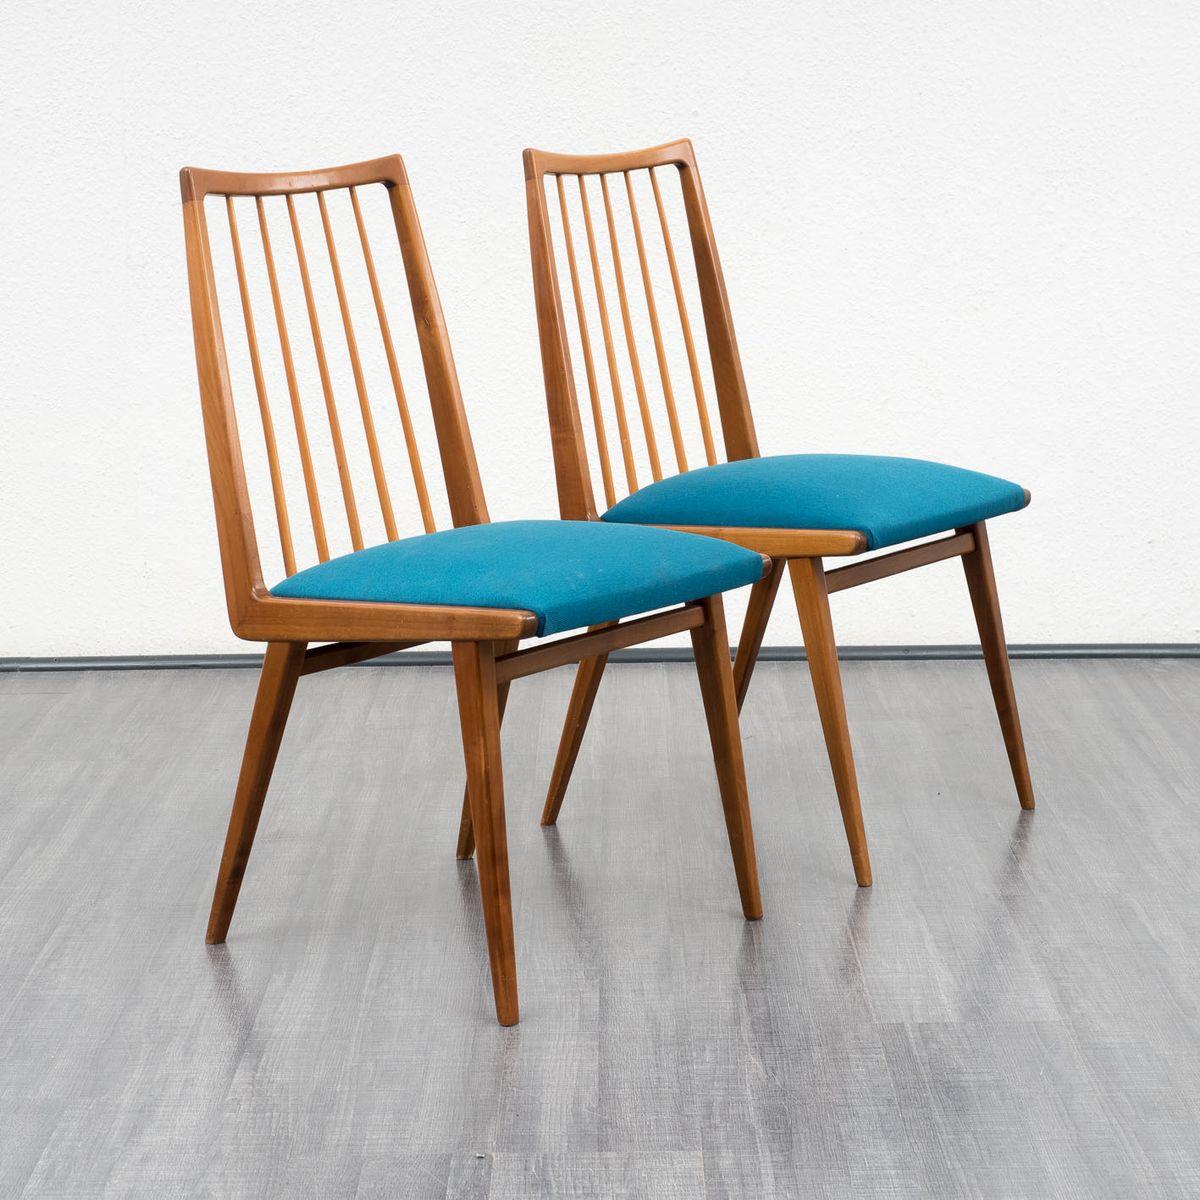 Cherry wood chairs